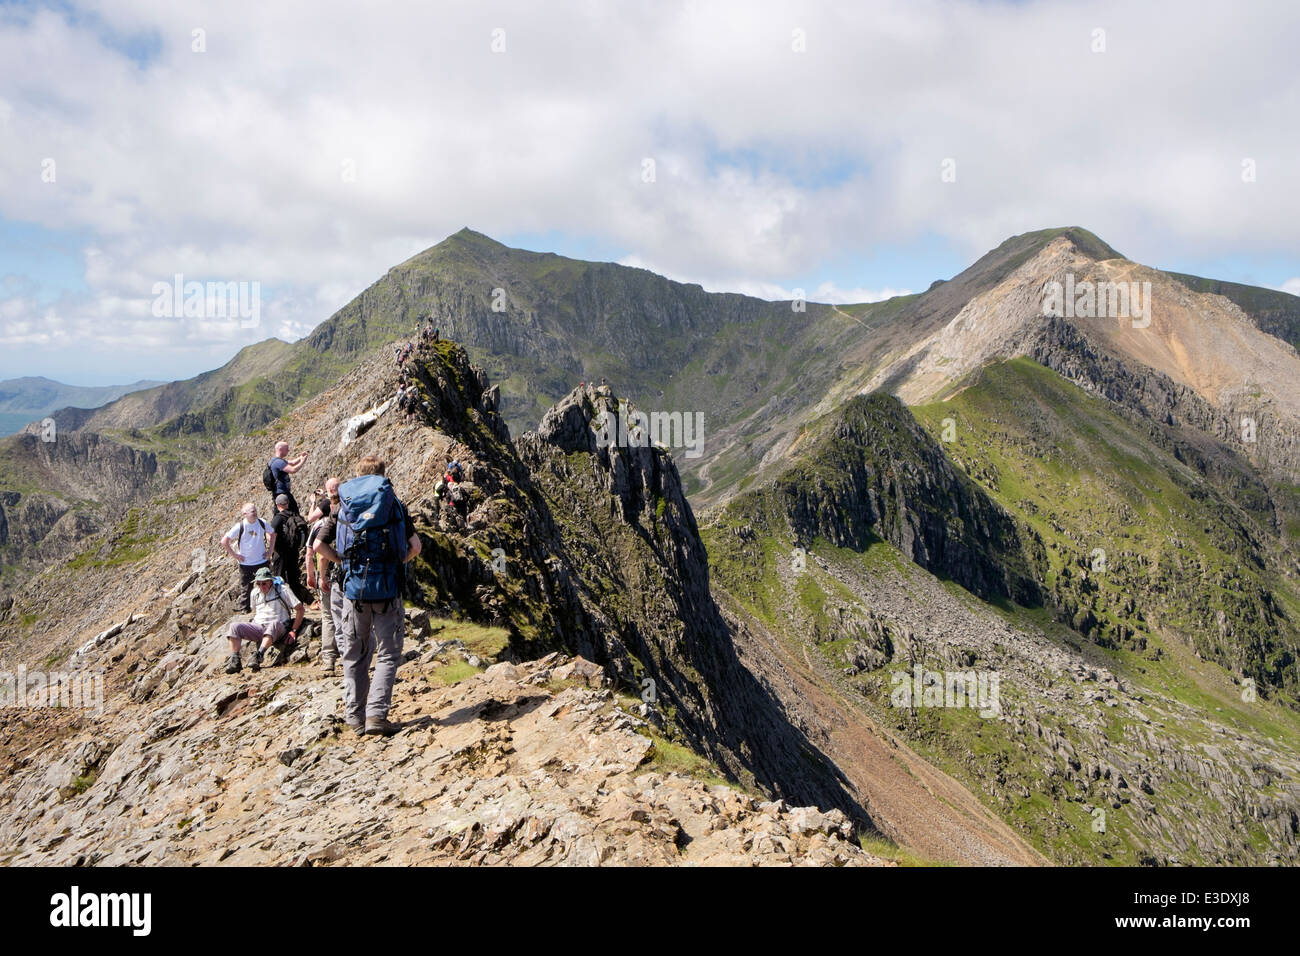 Walkers on Crib Goch ridge top scramble on the Snowdon Horseshoe with Crib y Ddysgl and Mt Snowdon peak in Snowdonia - Stock Image